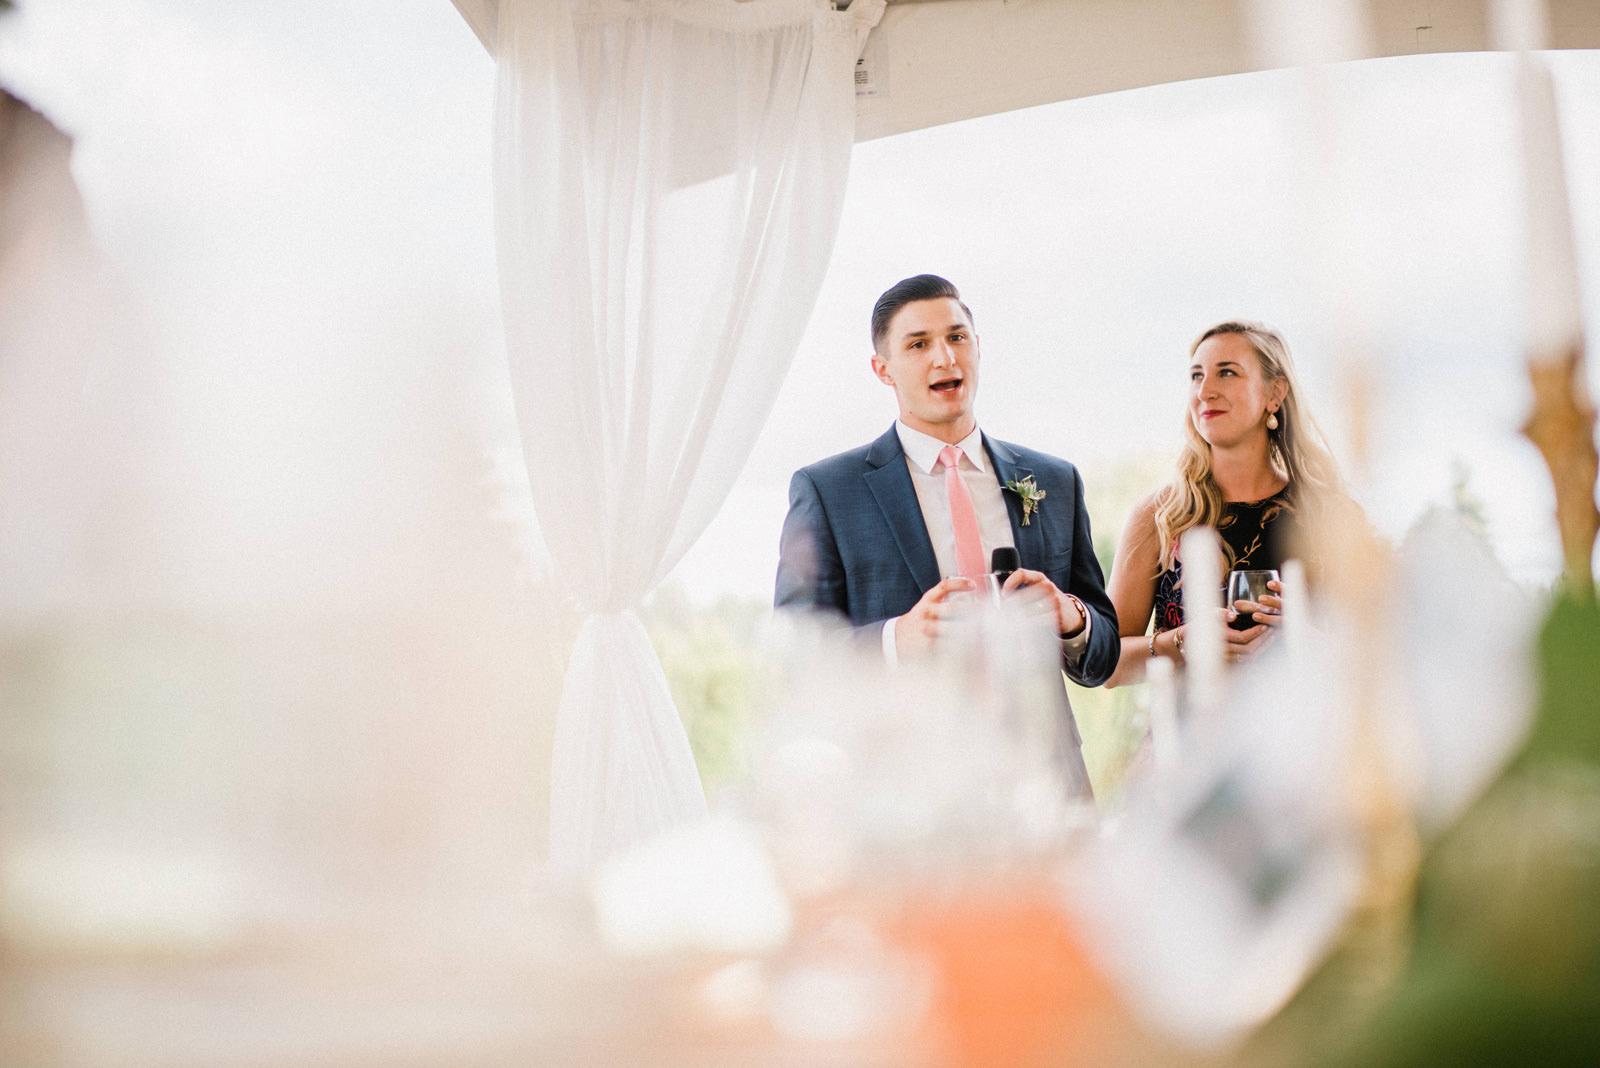 063-woodinville-lavendar-farm-wedding-with-golden-glowy-photos.jpg